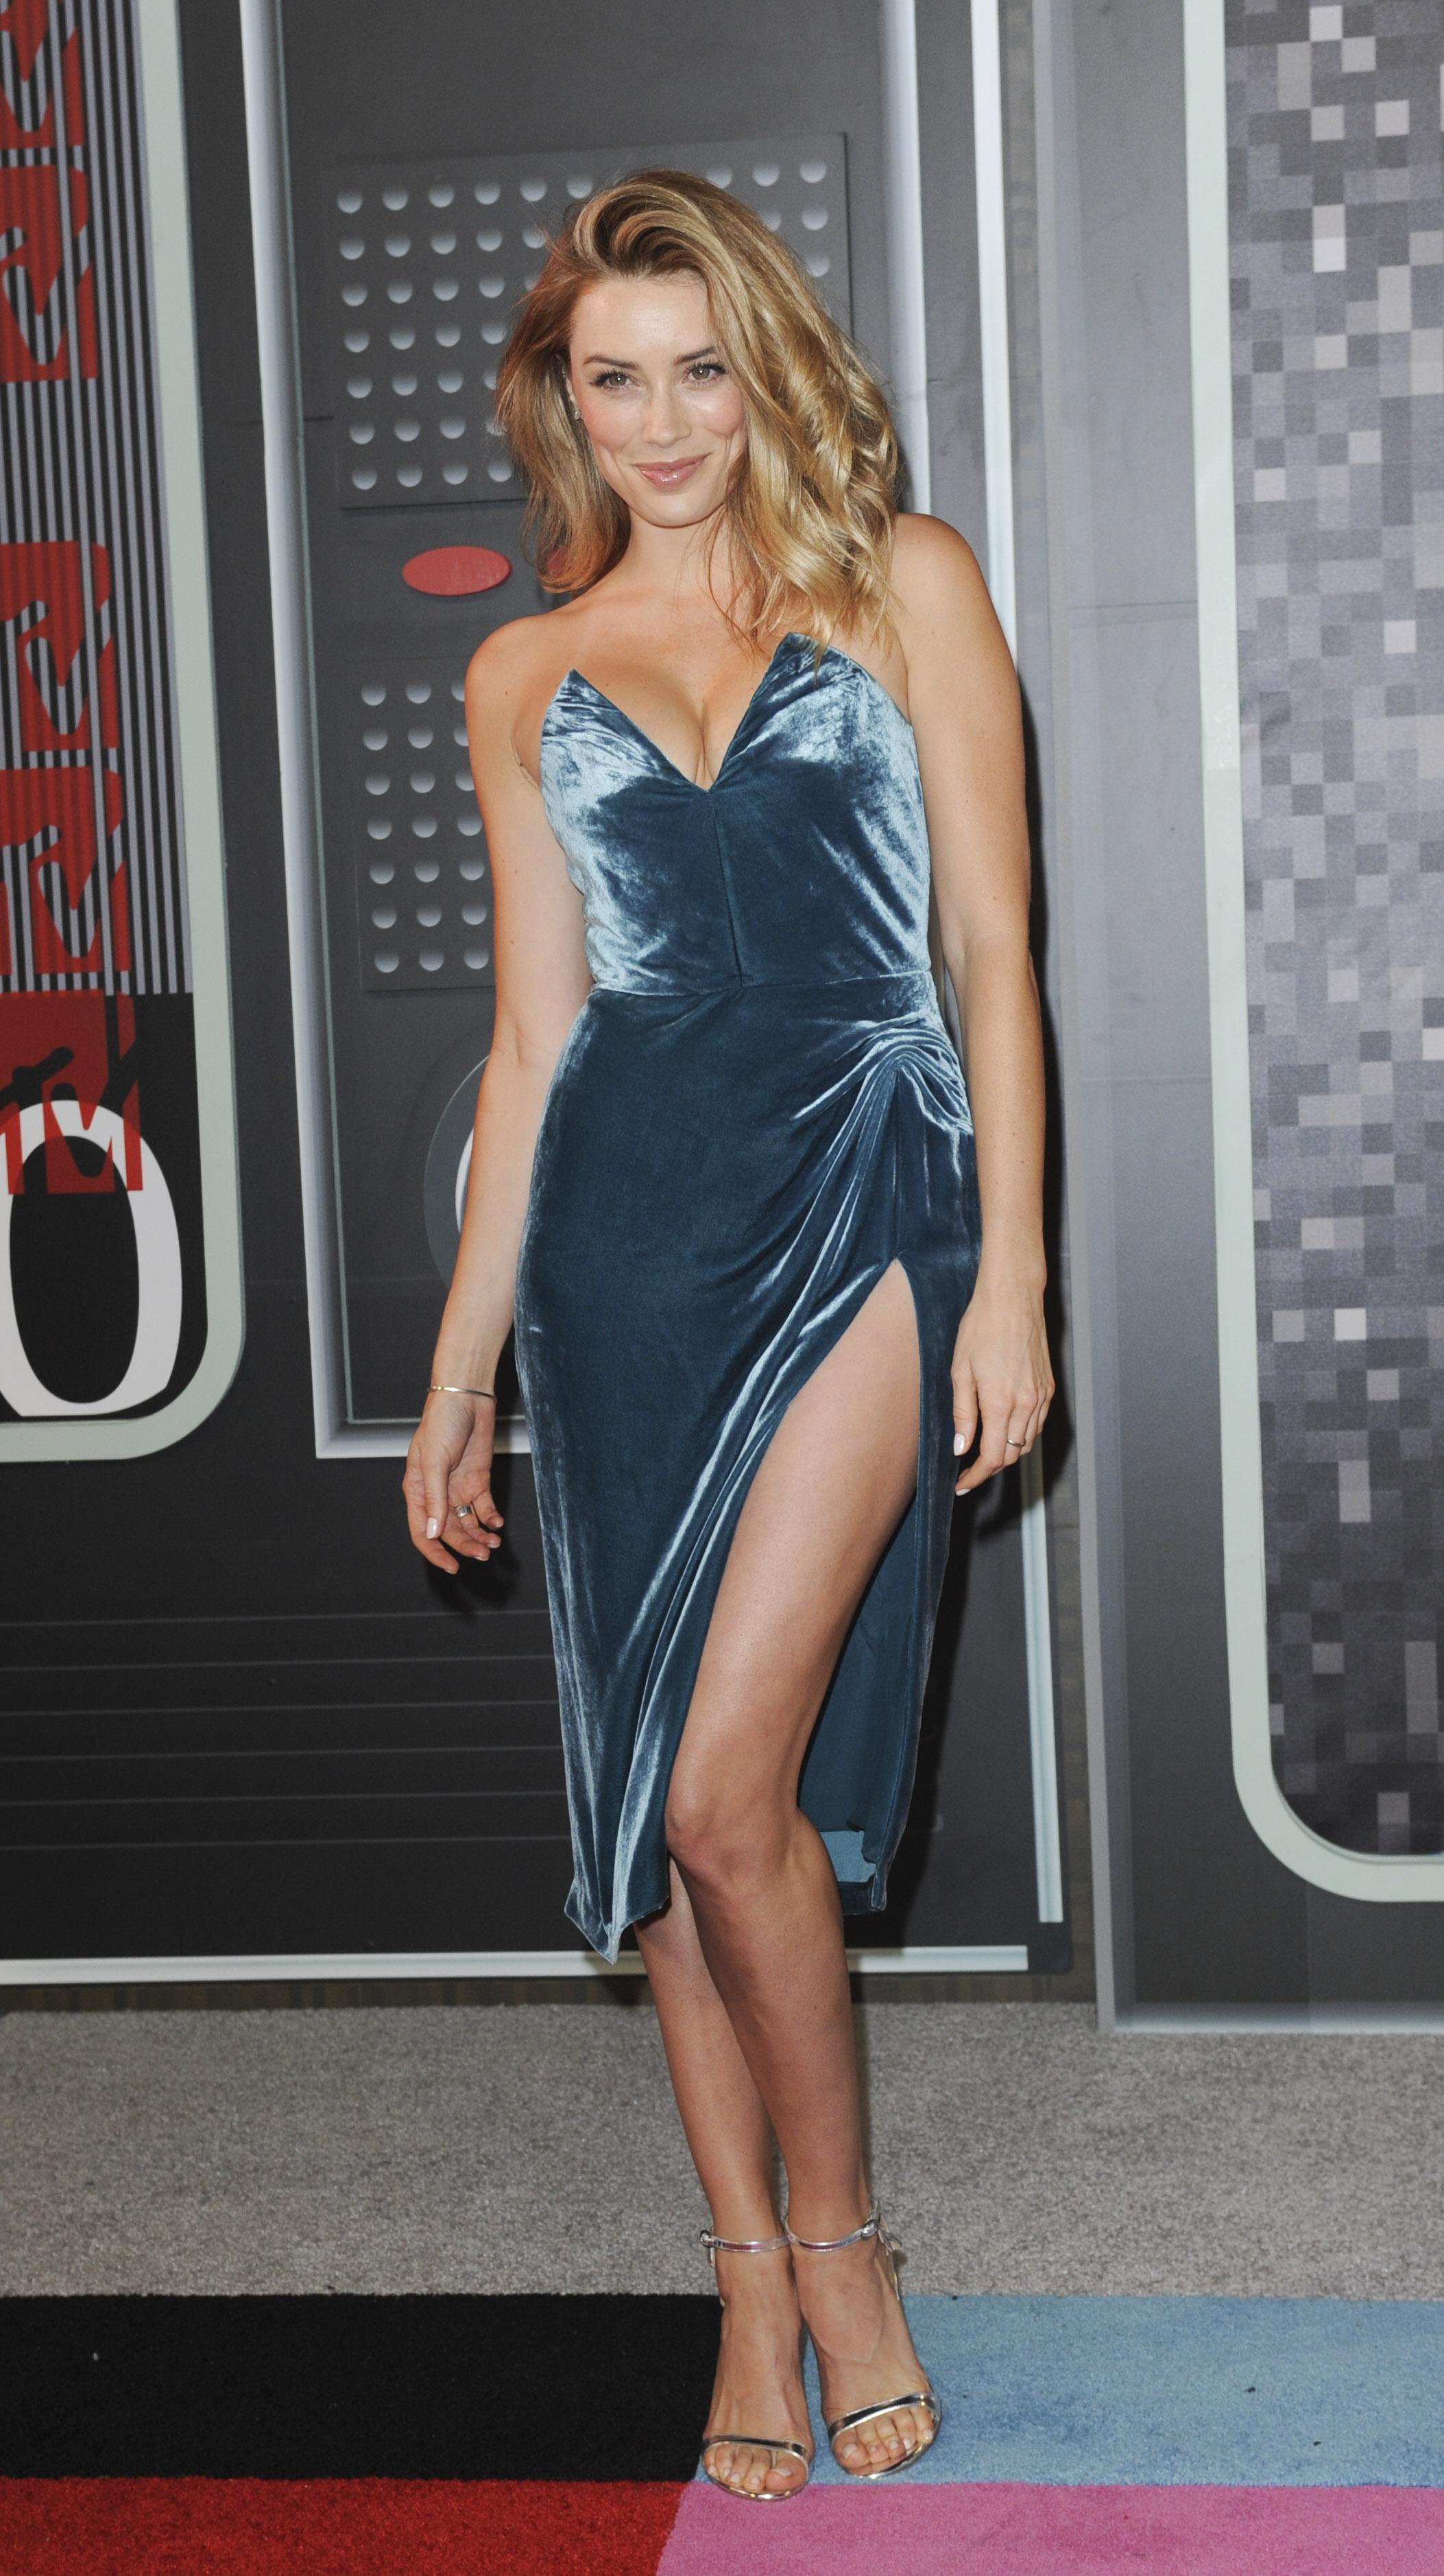 Erotica Arielle Vandenberg naked (29 photo) Hot, Snapchat, lingerie